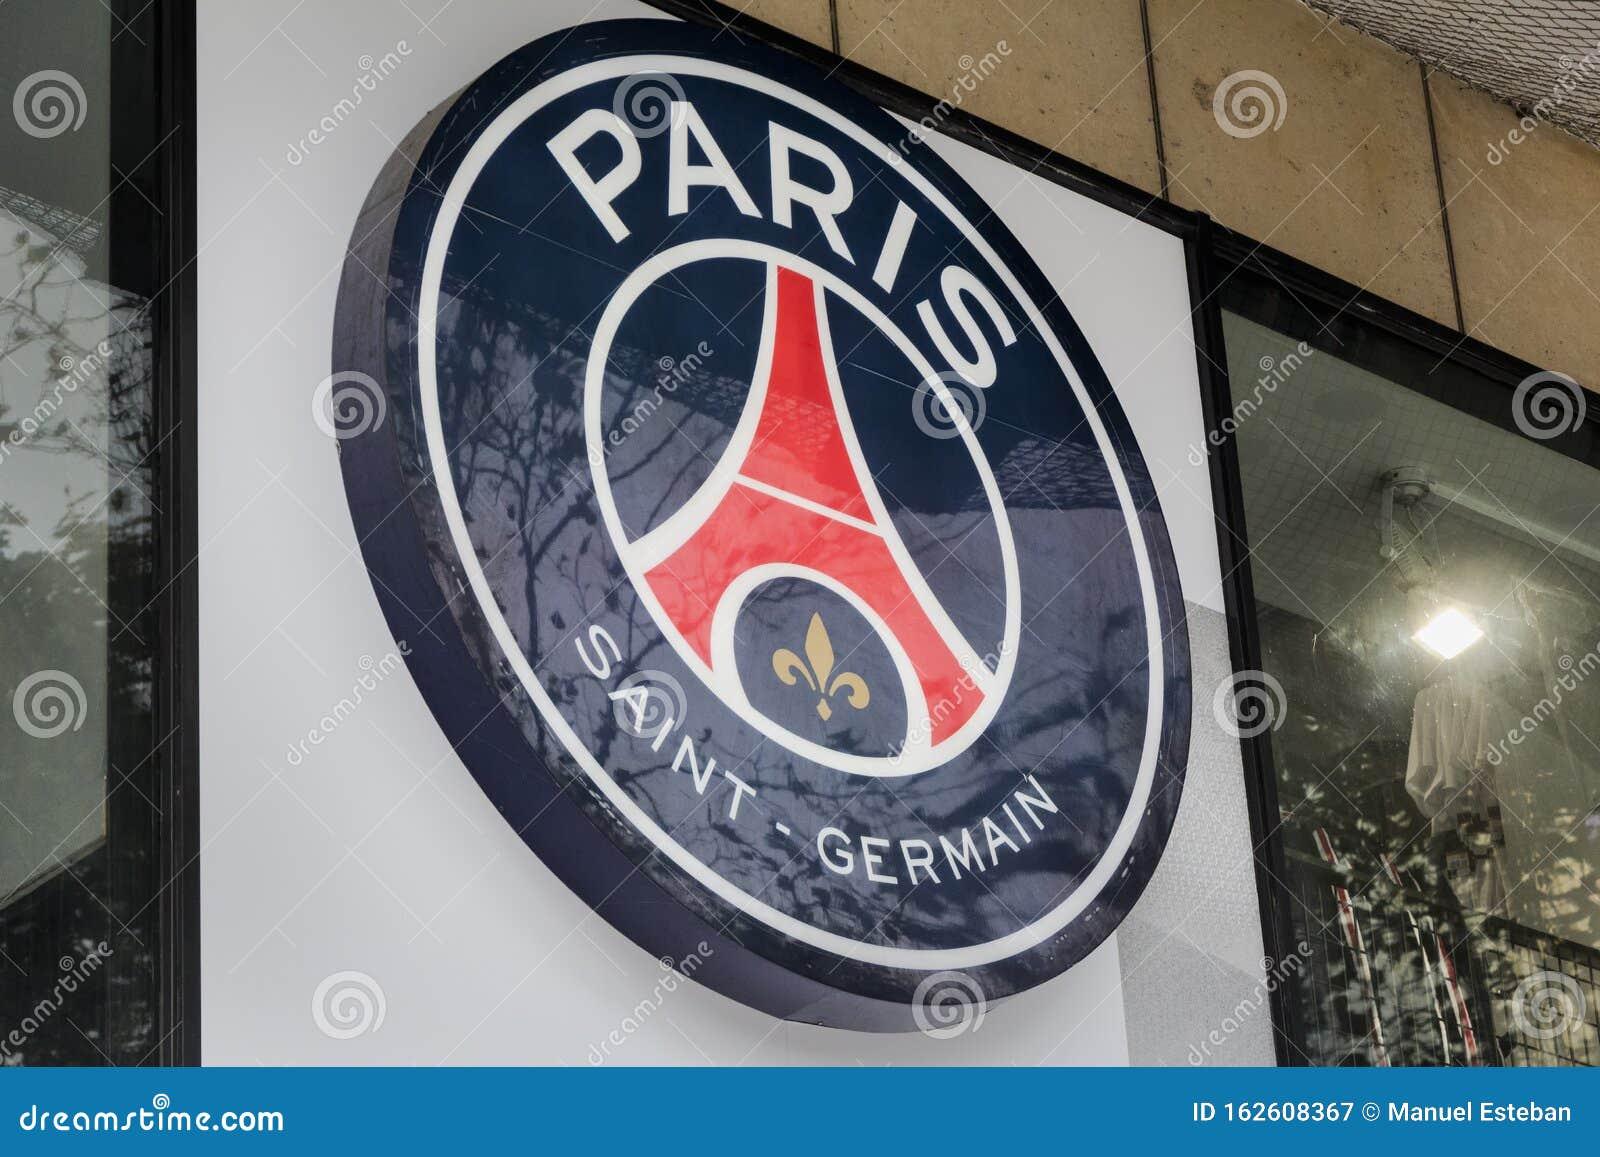 Paris Saint Germain Logo Auf Saint Germain Fussball Club Store Redaktionelles Stockfotografie Bild Von Germain Logo 162608367